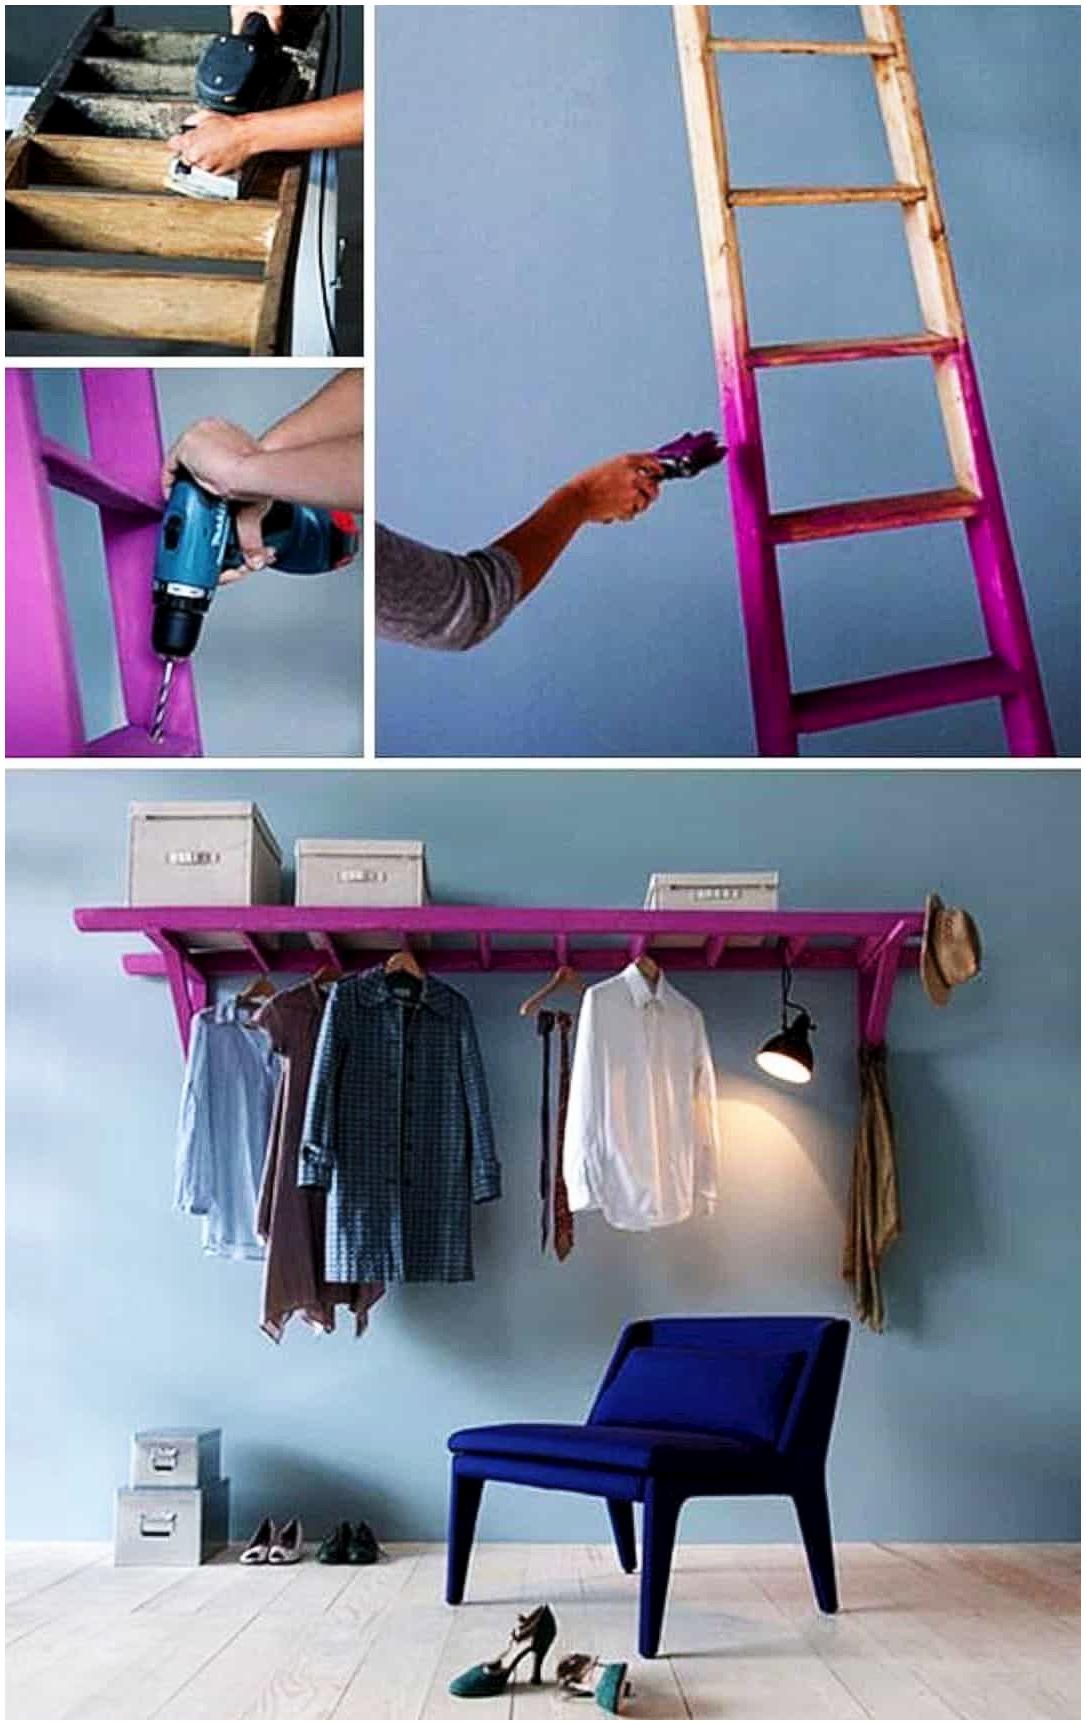 5 Ladder Wardrobe via Simphome